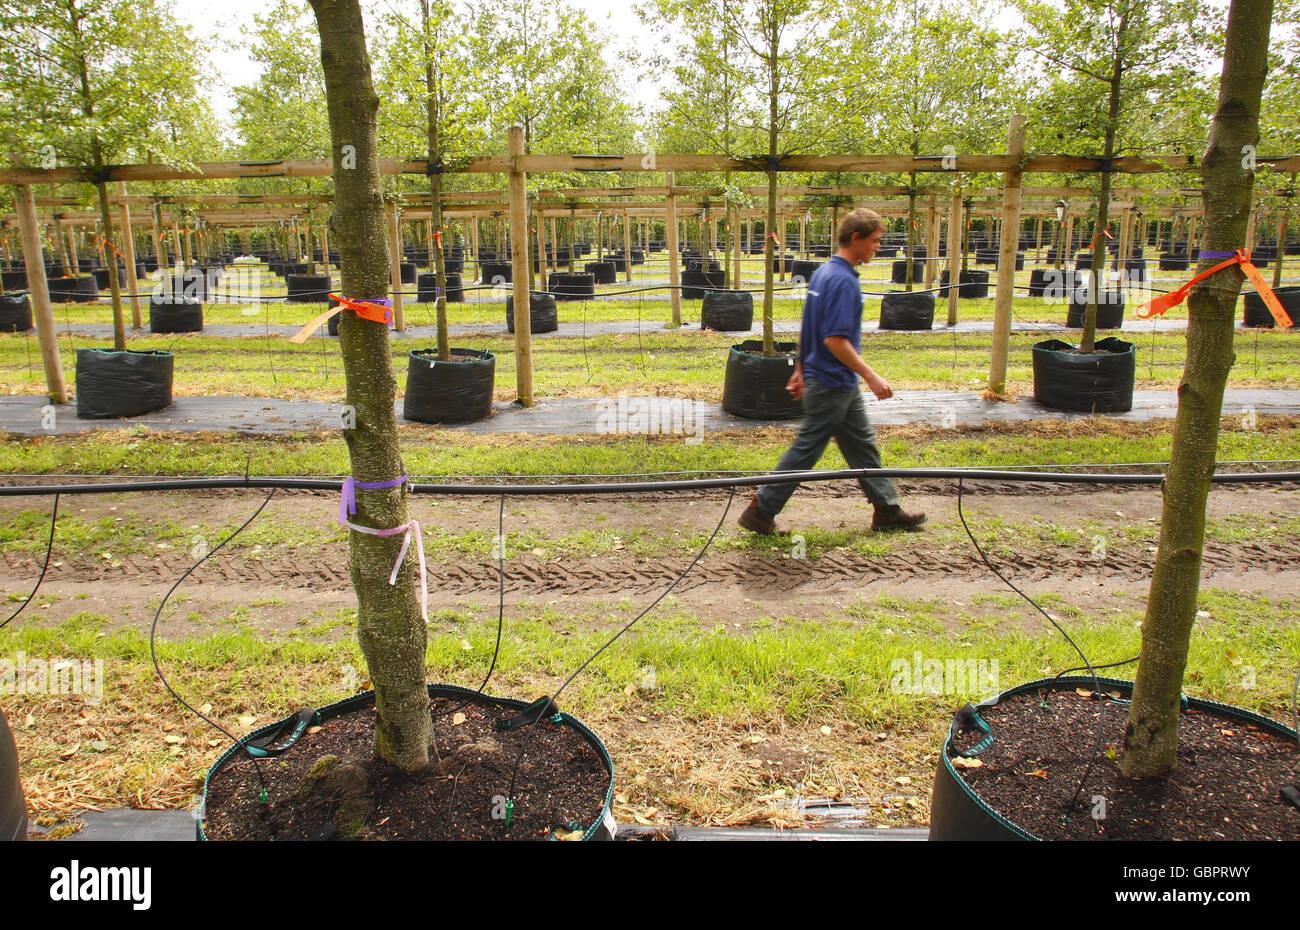 Olympic Park trees Stock Photo